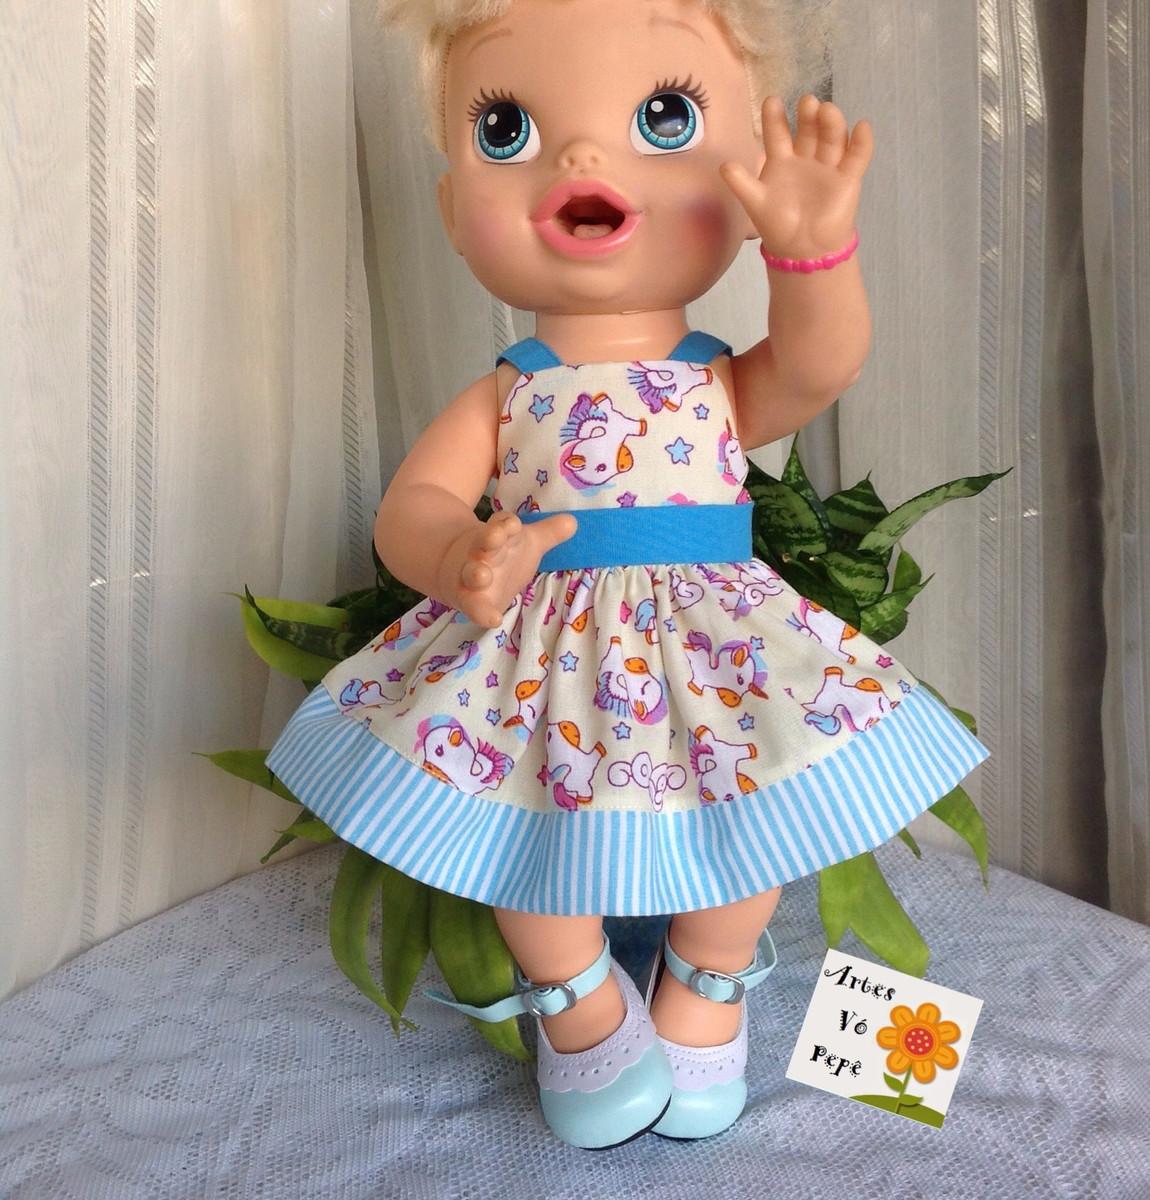 ea6ca7e970 Vestido unicórnio p baby alive (boneca ) no Elo7